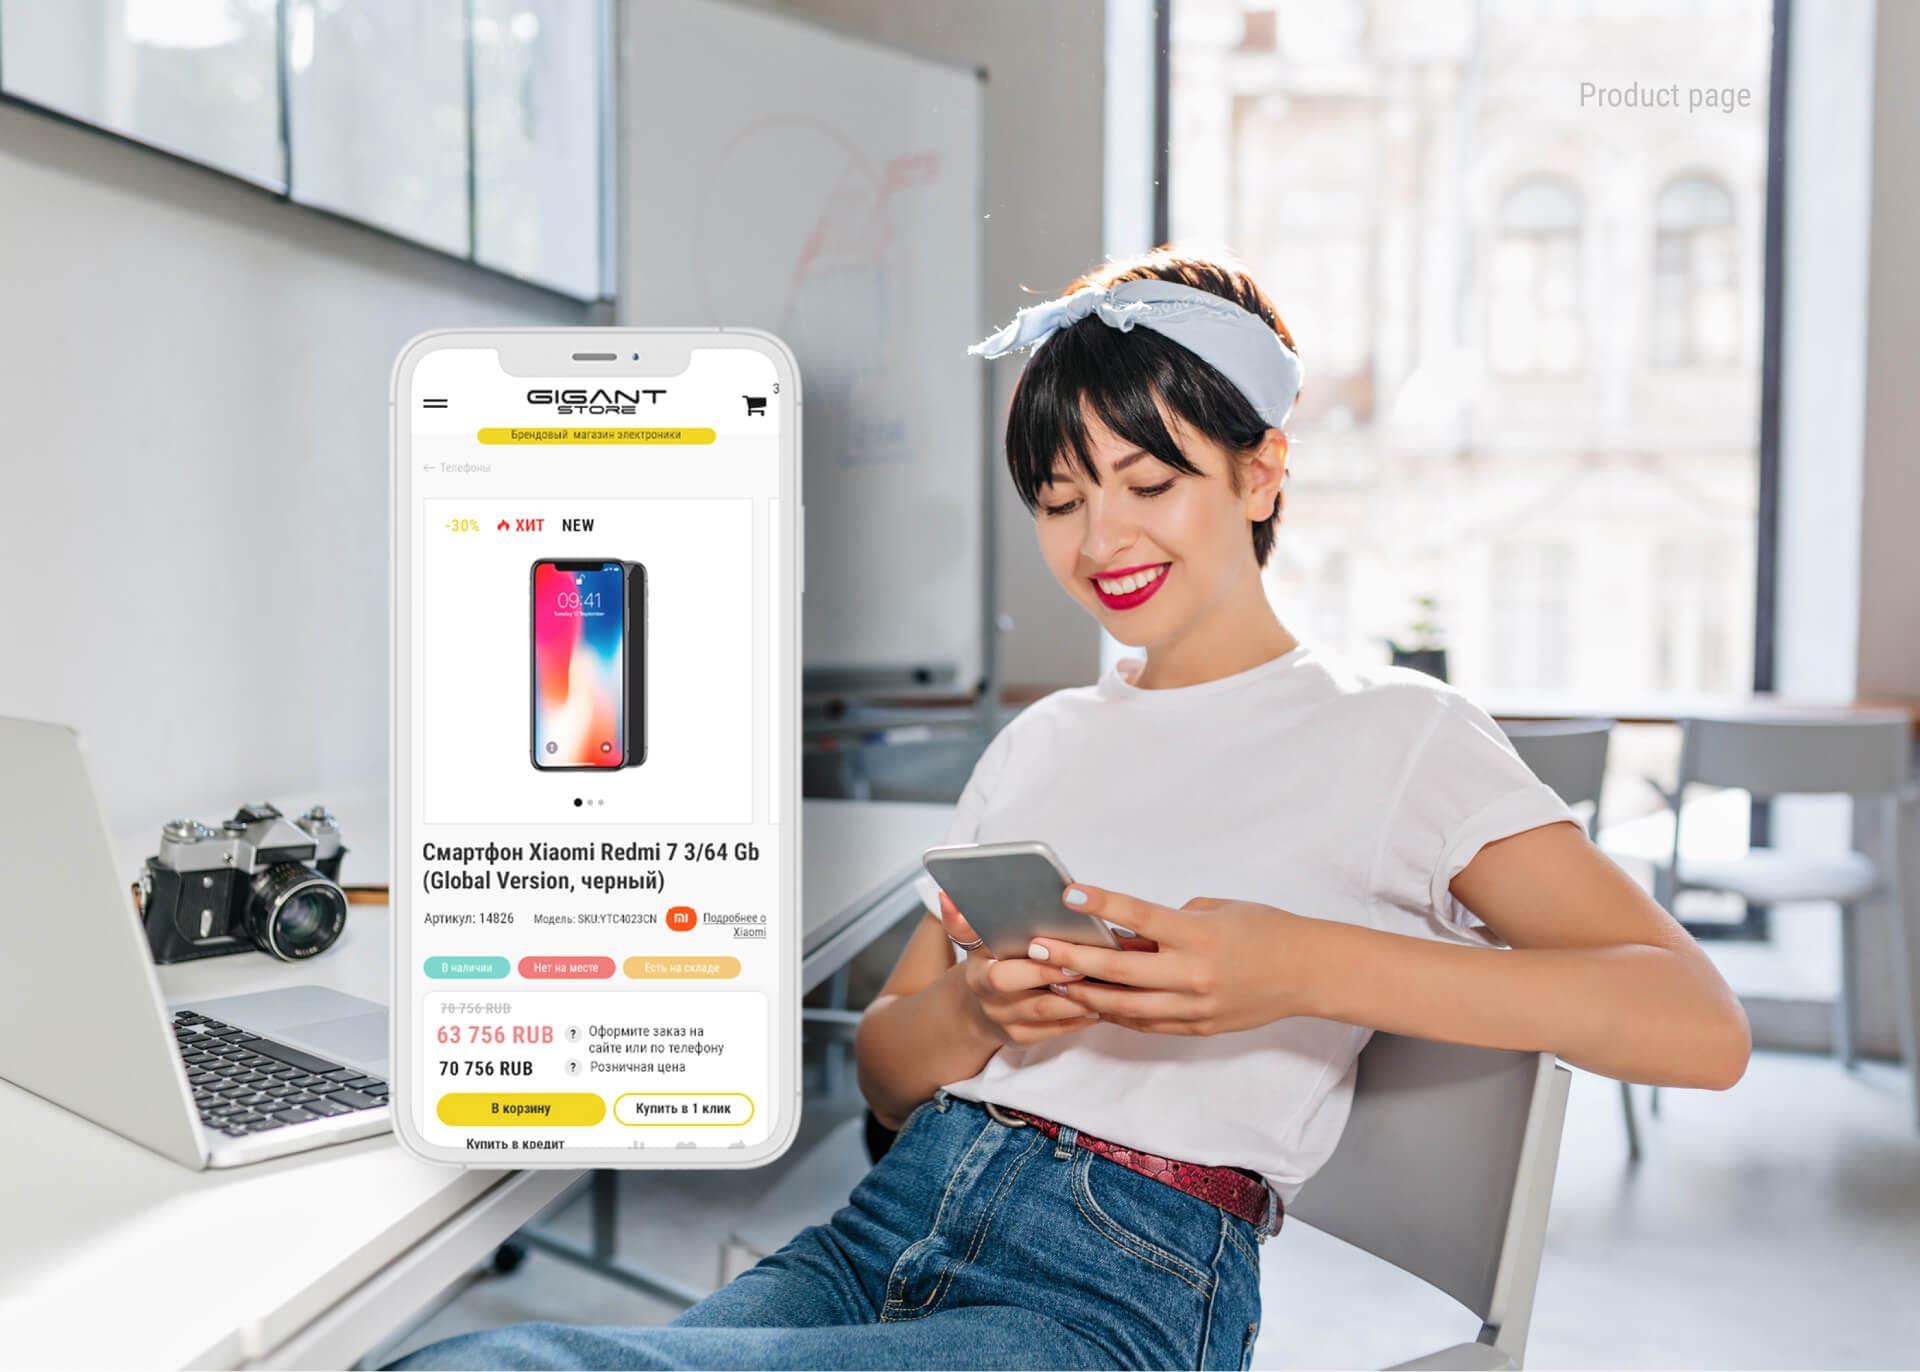 Разработка под ключ брендового интернет-магазина электроники - кейс iPapus Agency